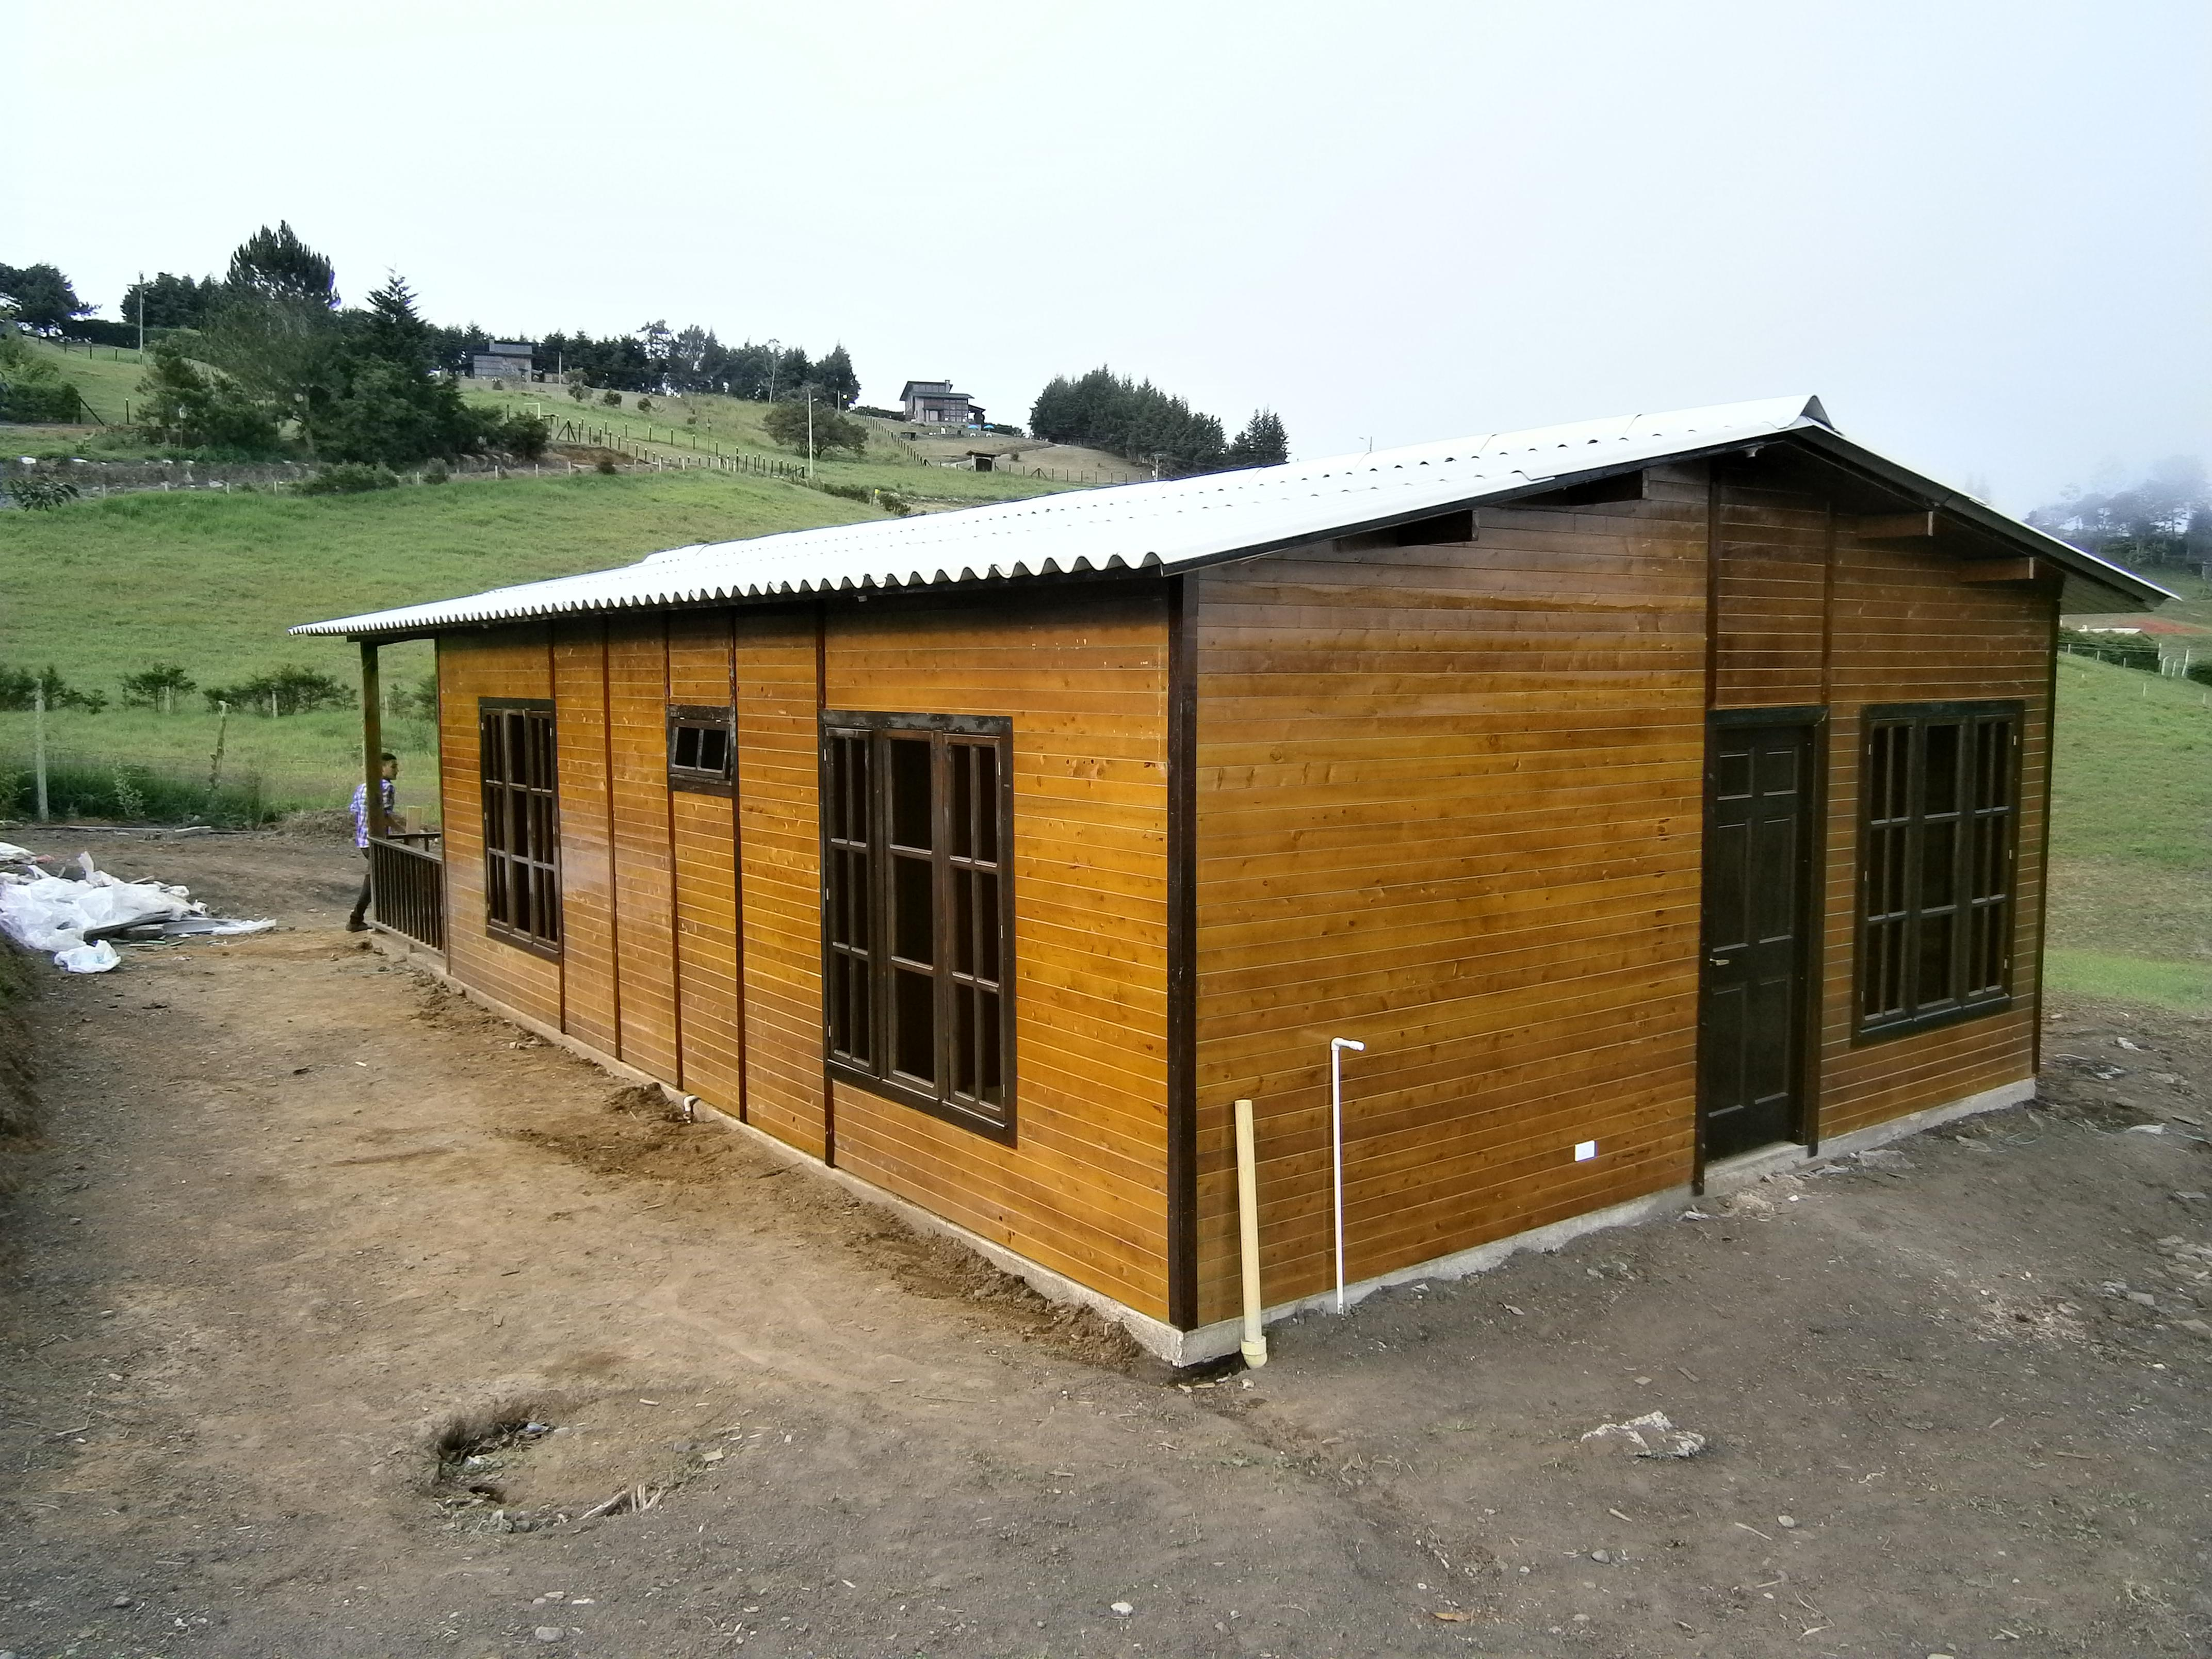 Top casas prefabricadas costa rica wallpapers - Casa de maderas prefabricadas ...